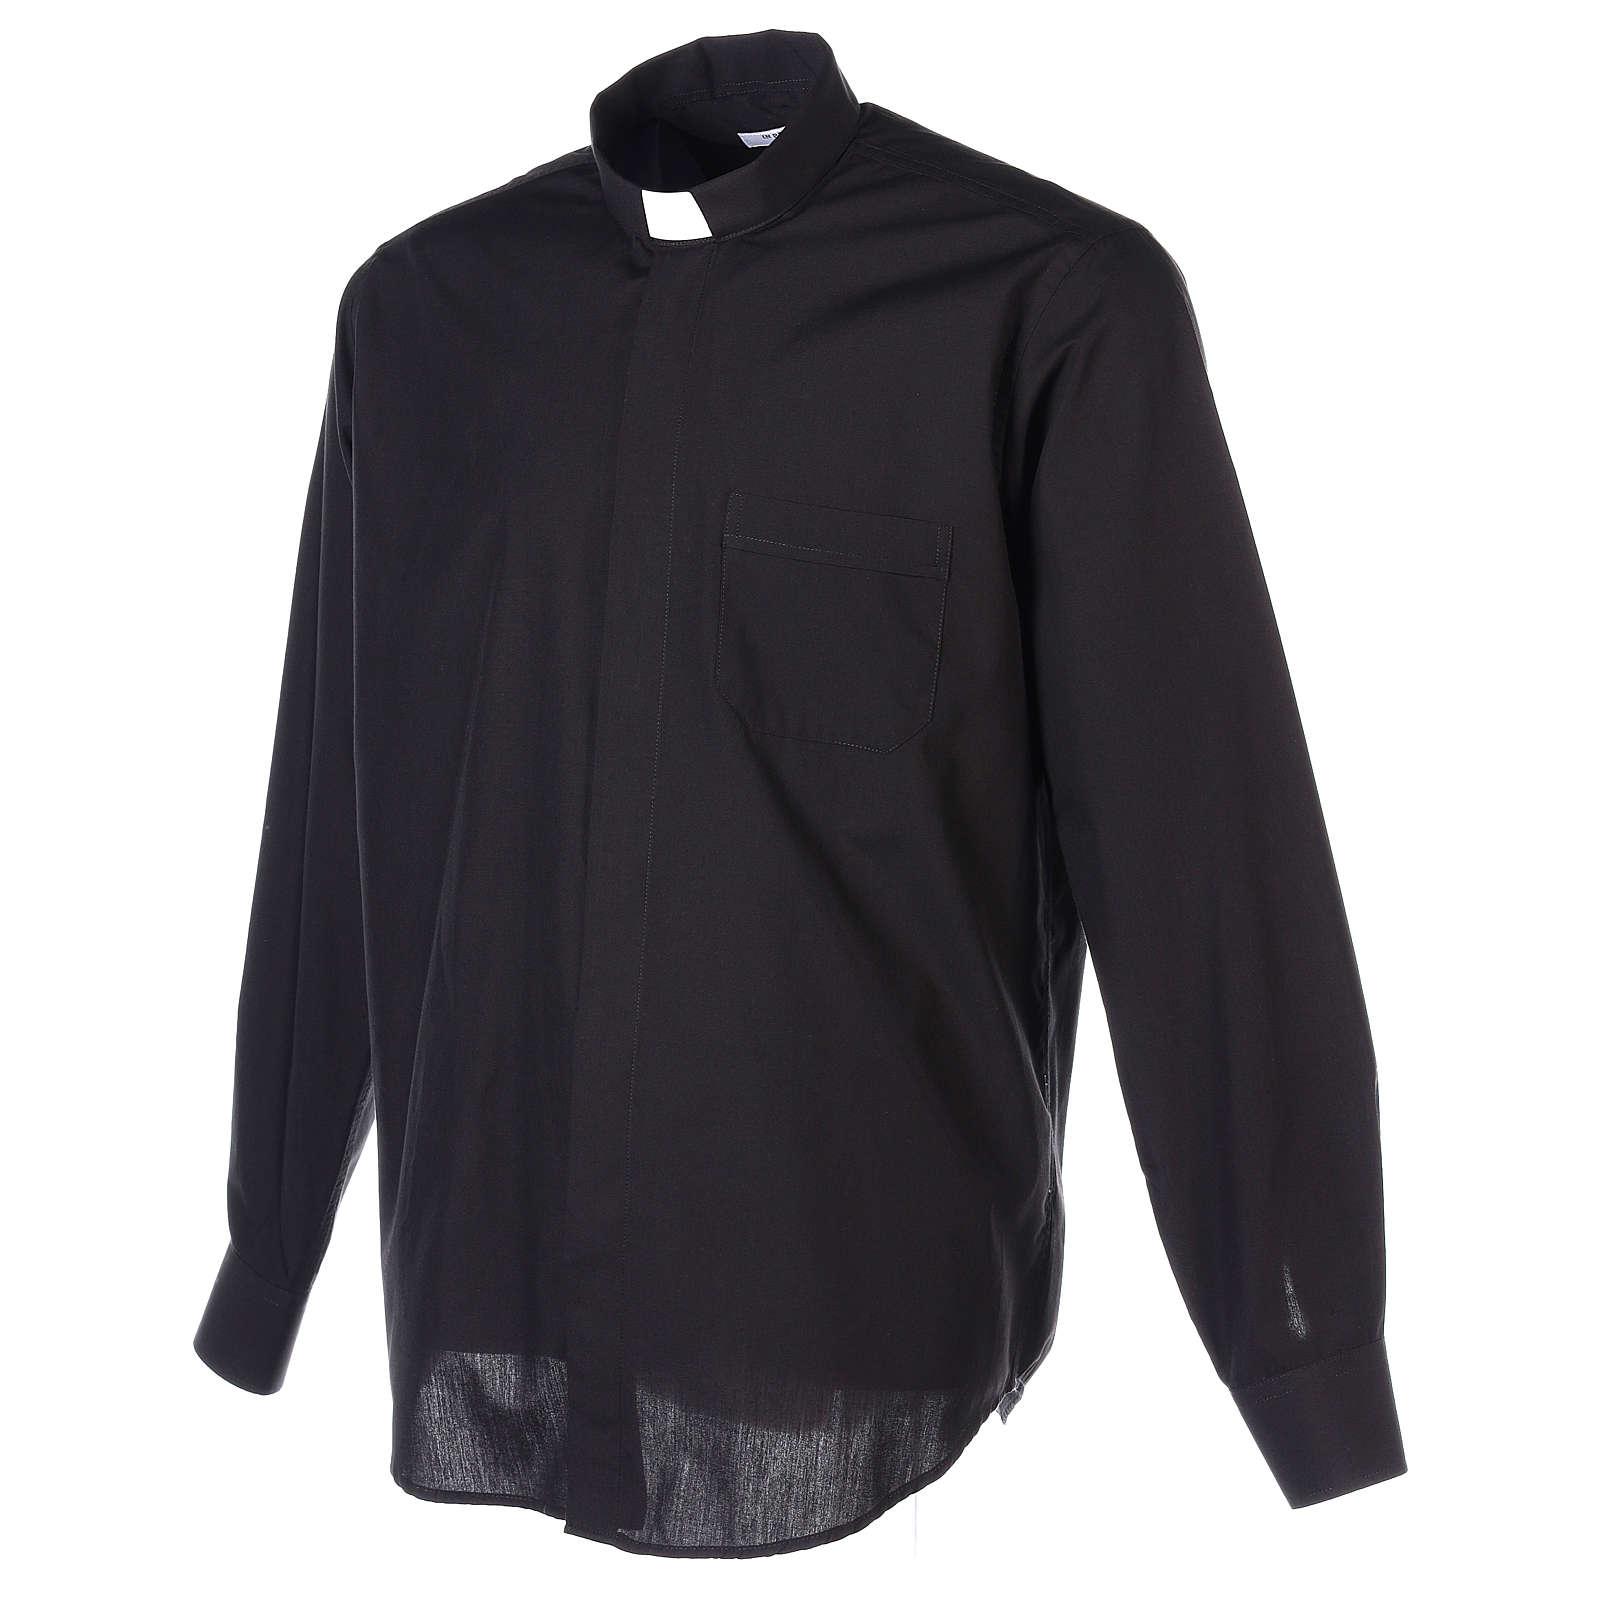 Camisa Clergyman manga longa misto algodão preto In Primis 4